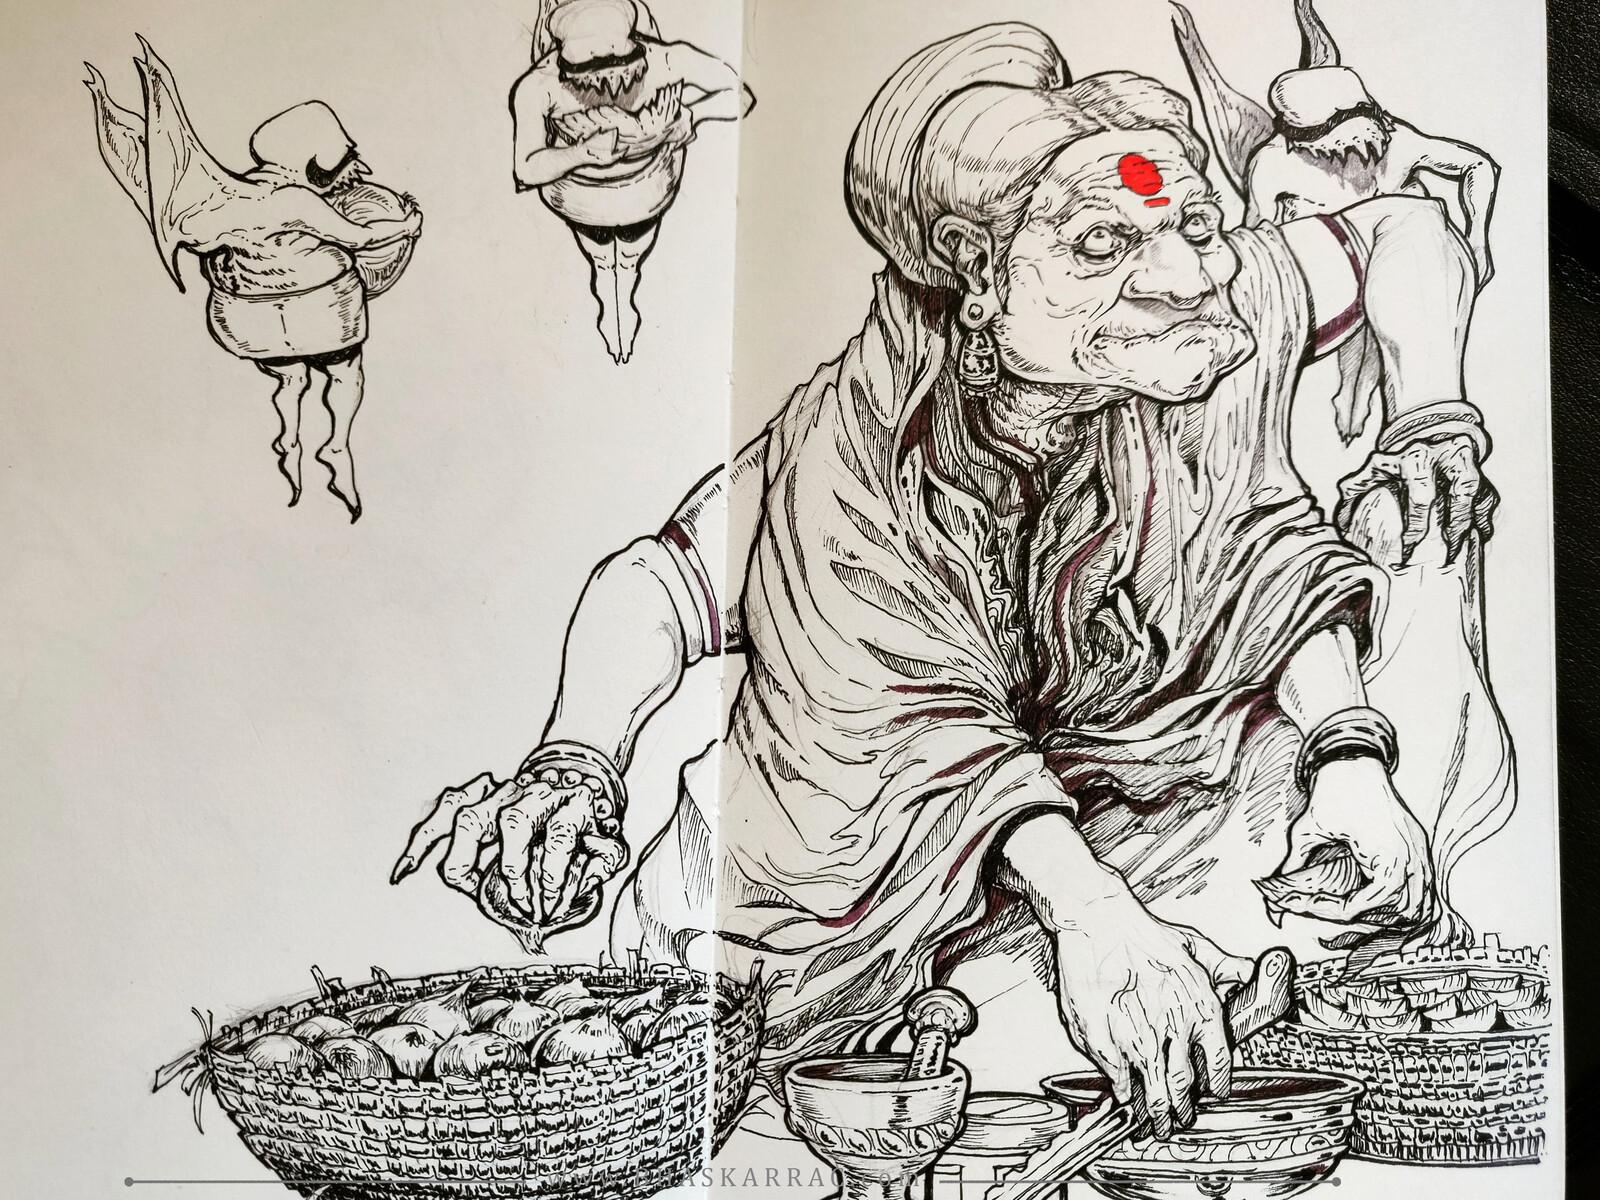 Amma the spice-seller